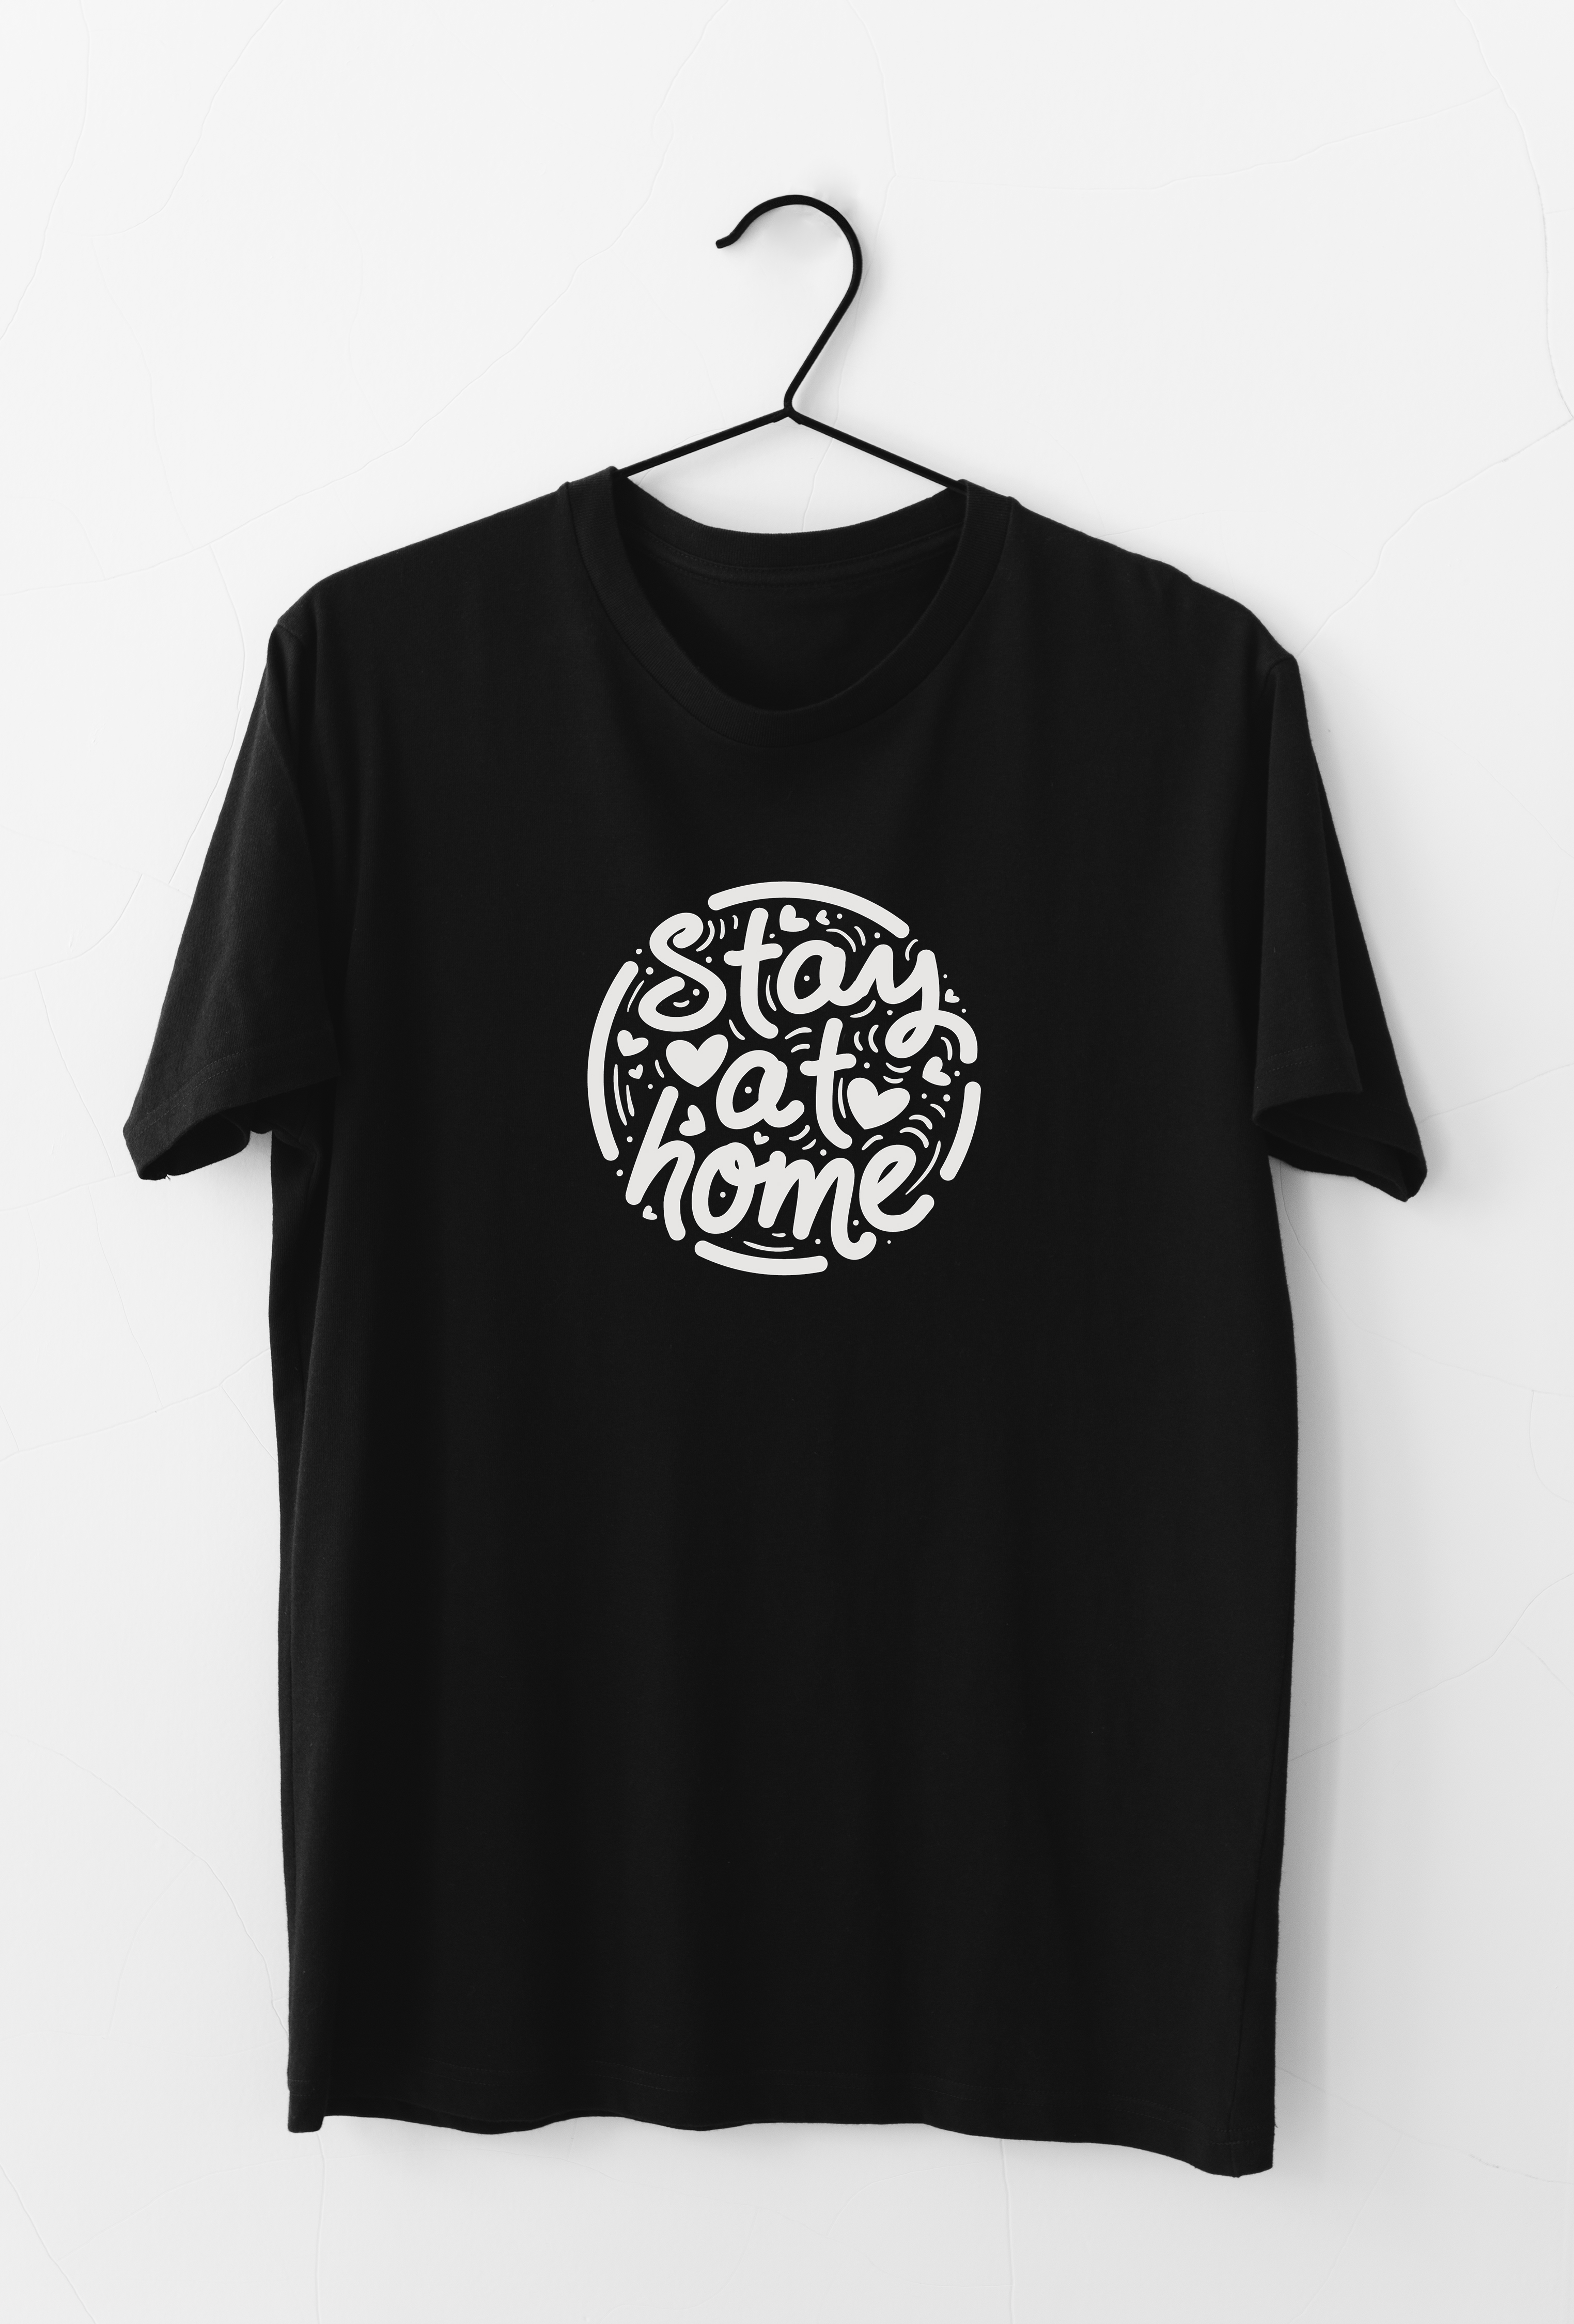 Free T-Shirt Mockup Tempalte